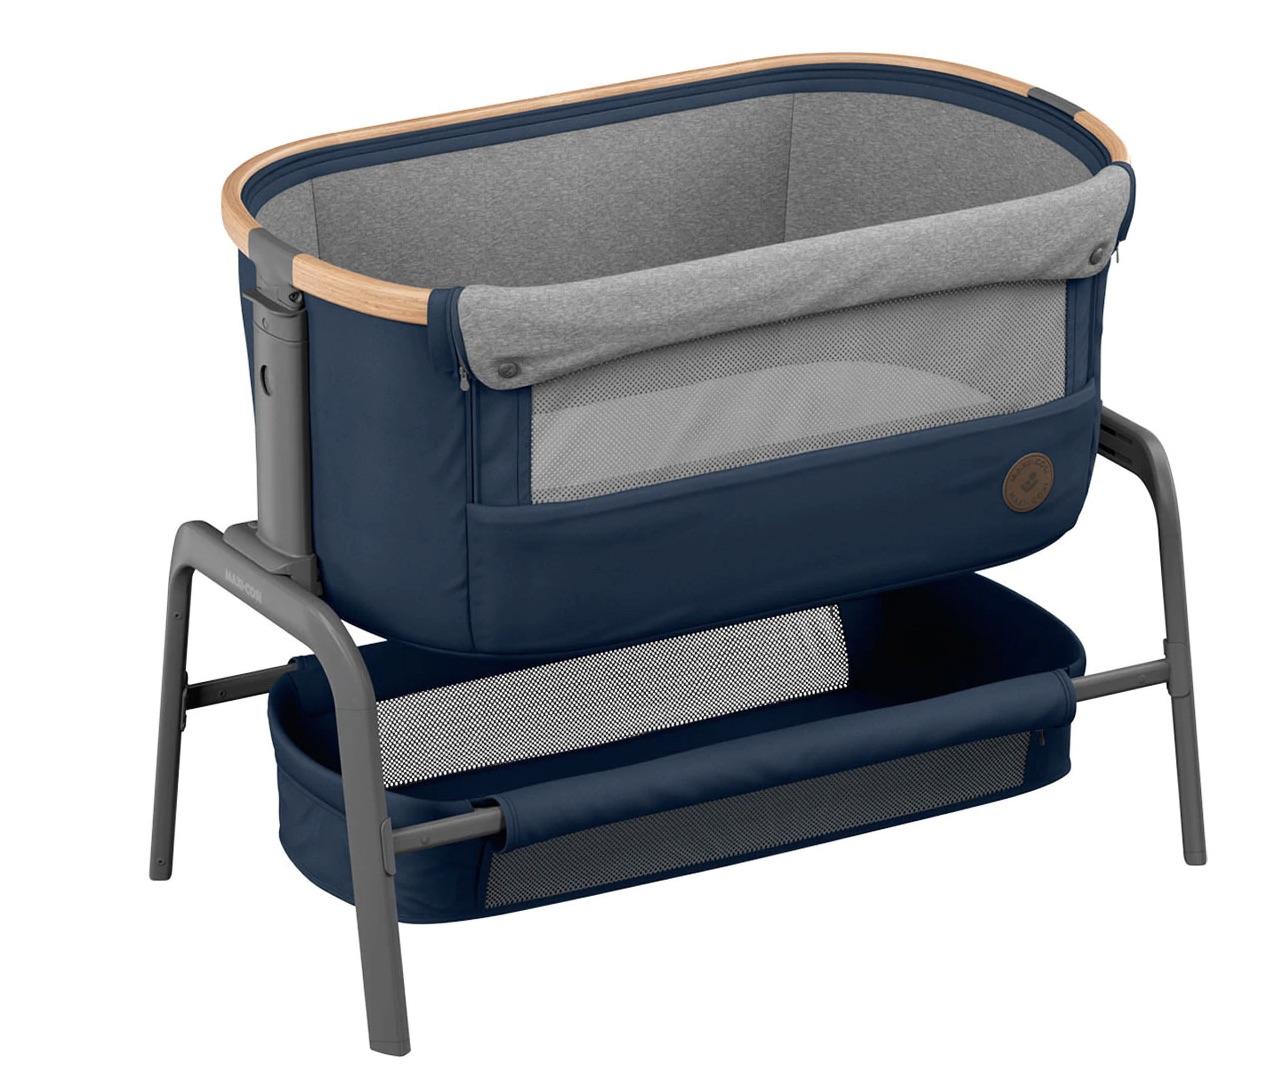 MAXI-COSI  Cuna de Viaje de Colecho Maxi-Cosis Iora Essential Blue azul